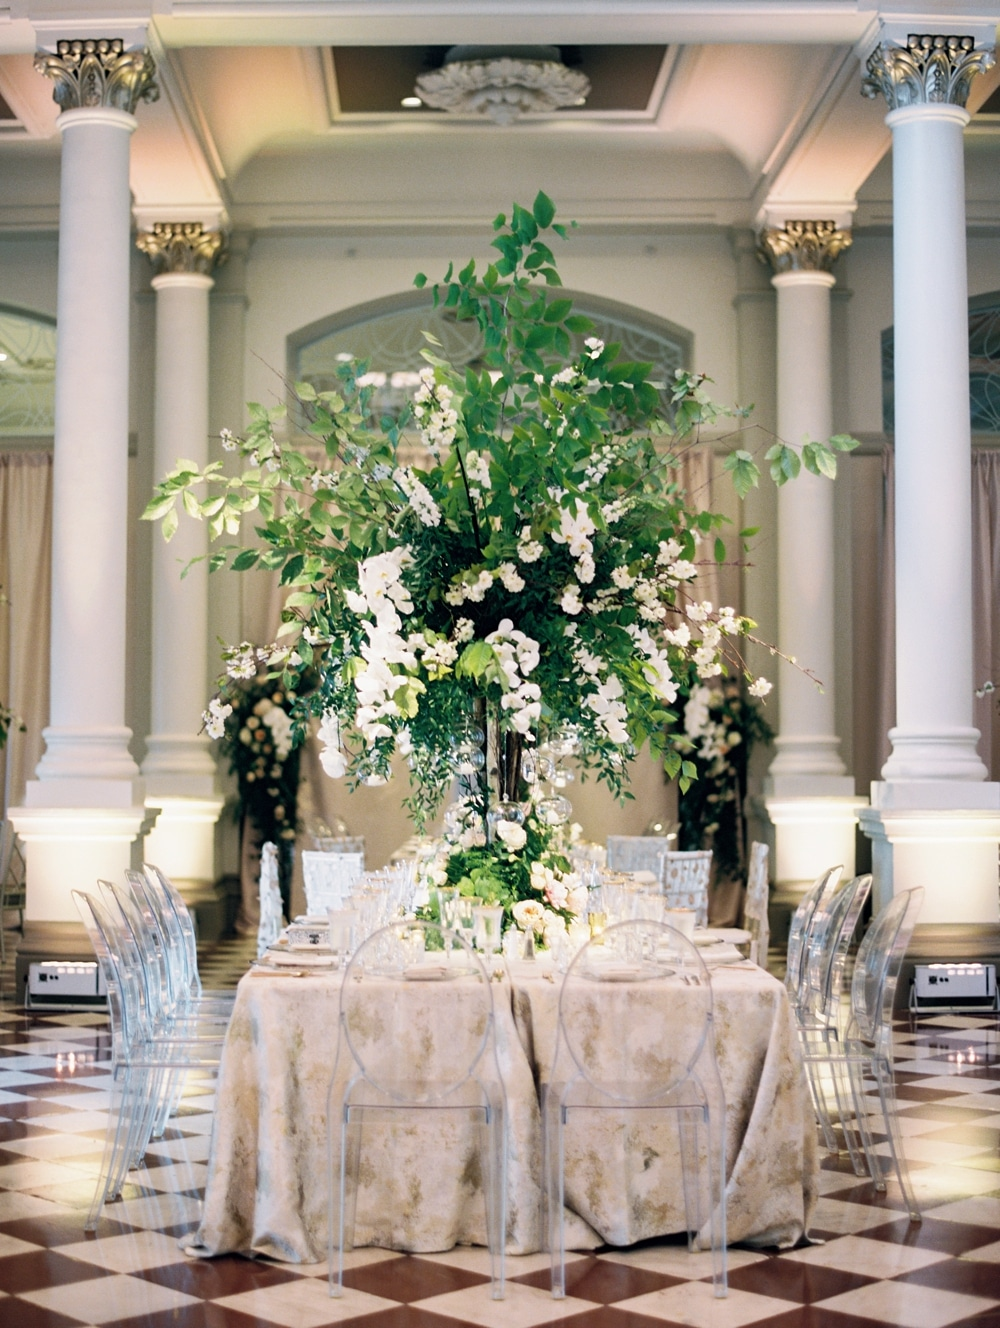 kristin-la-voie-photography-Cincinnati-Music-Hall-Wedding-277